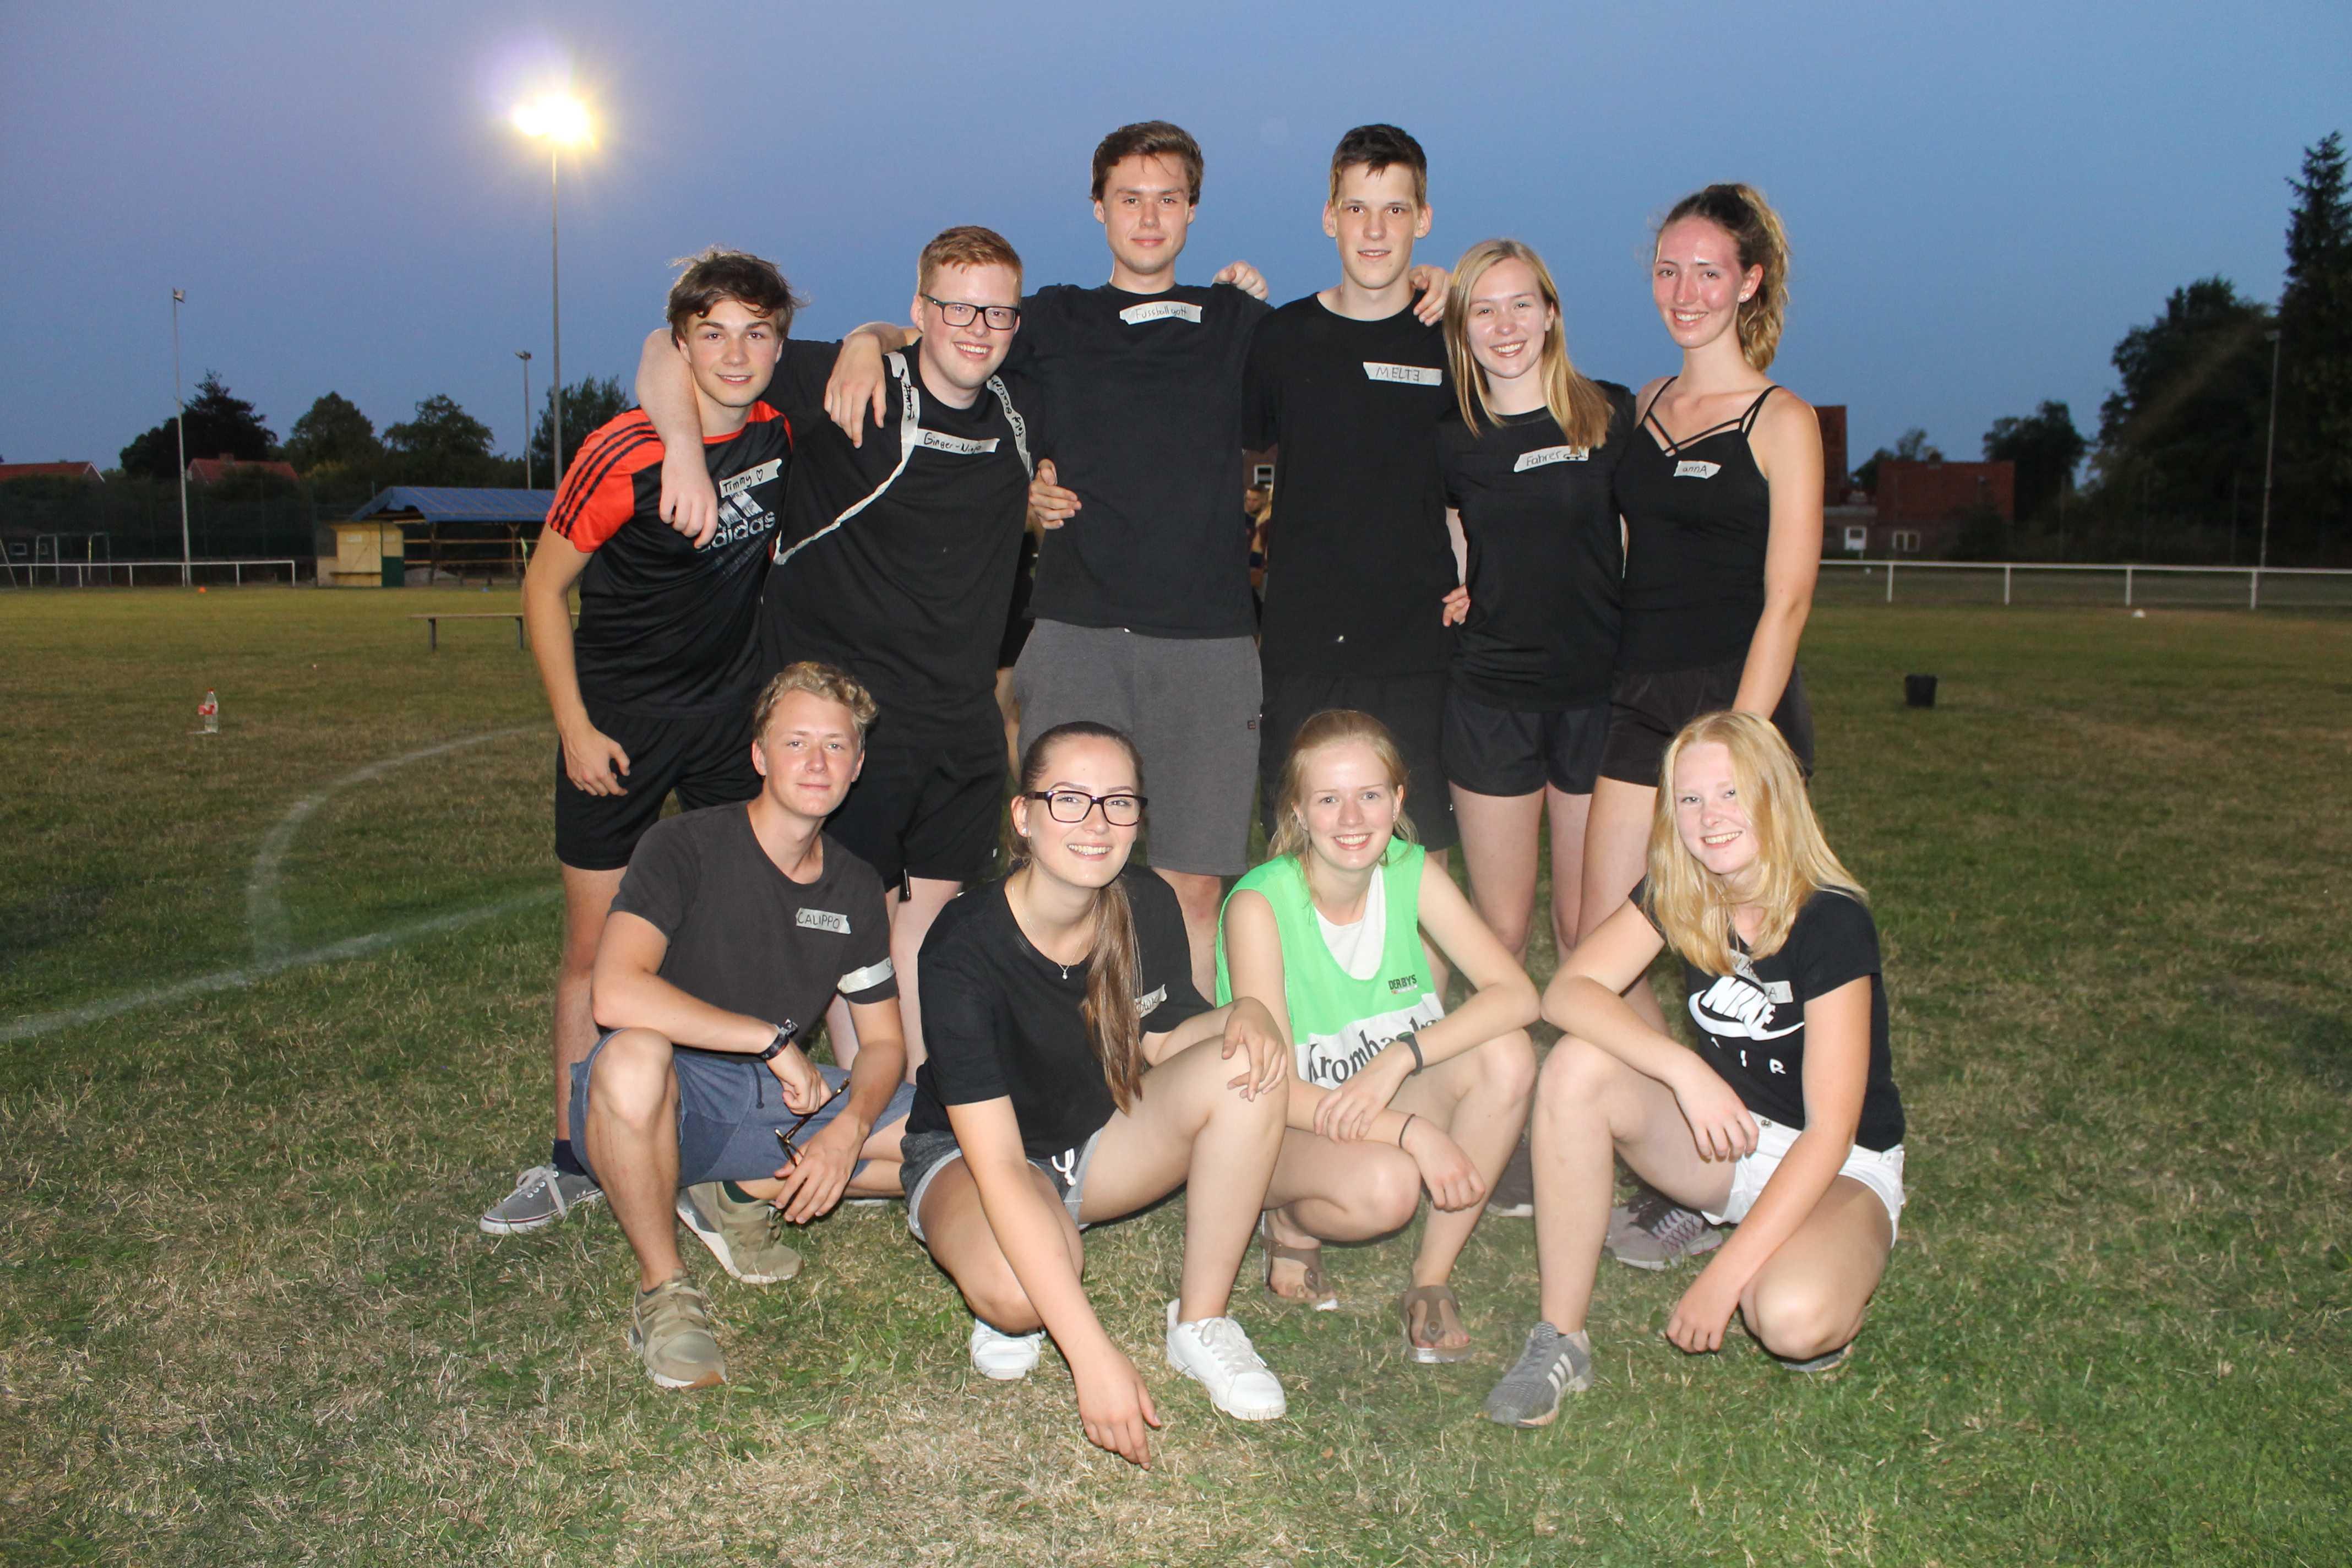 2018-07-27 Sportwoche - Flunkyball Turnier (65)